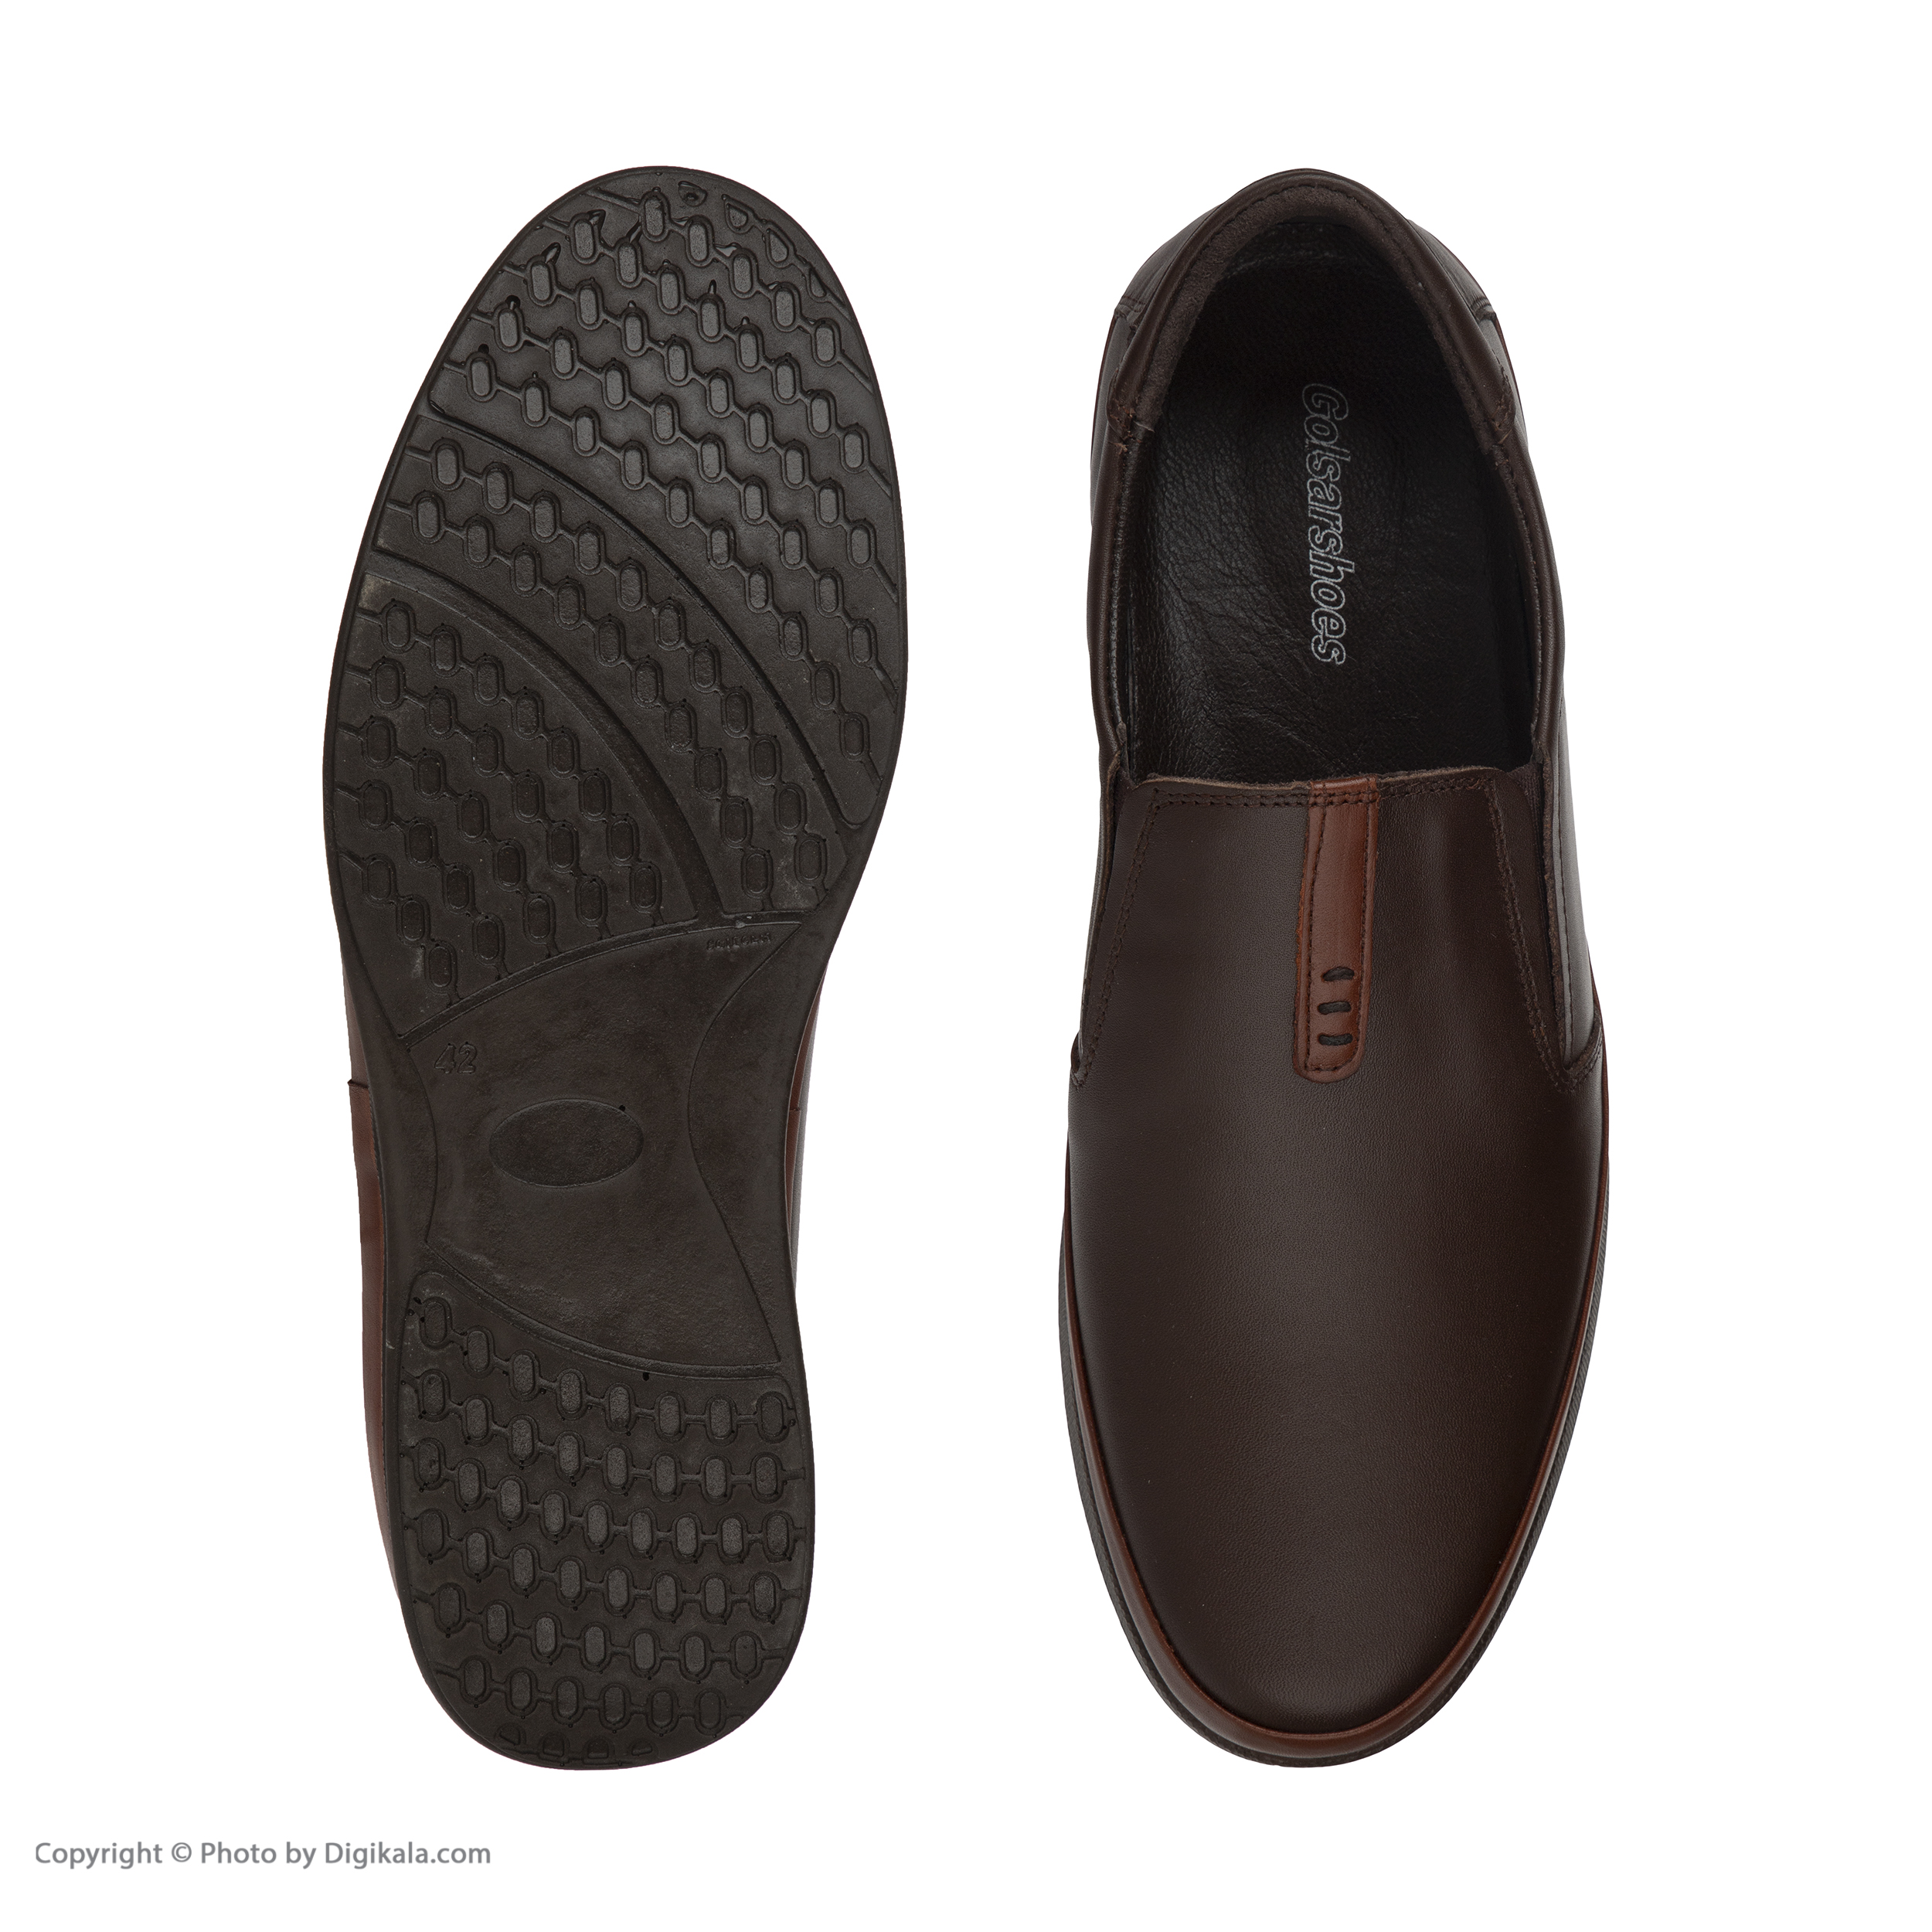 خرید                                     کفش روزمره مردانه گلسار مدل 7019A503130